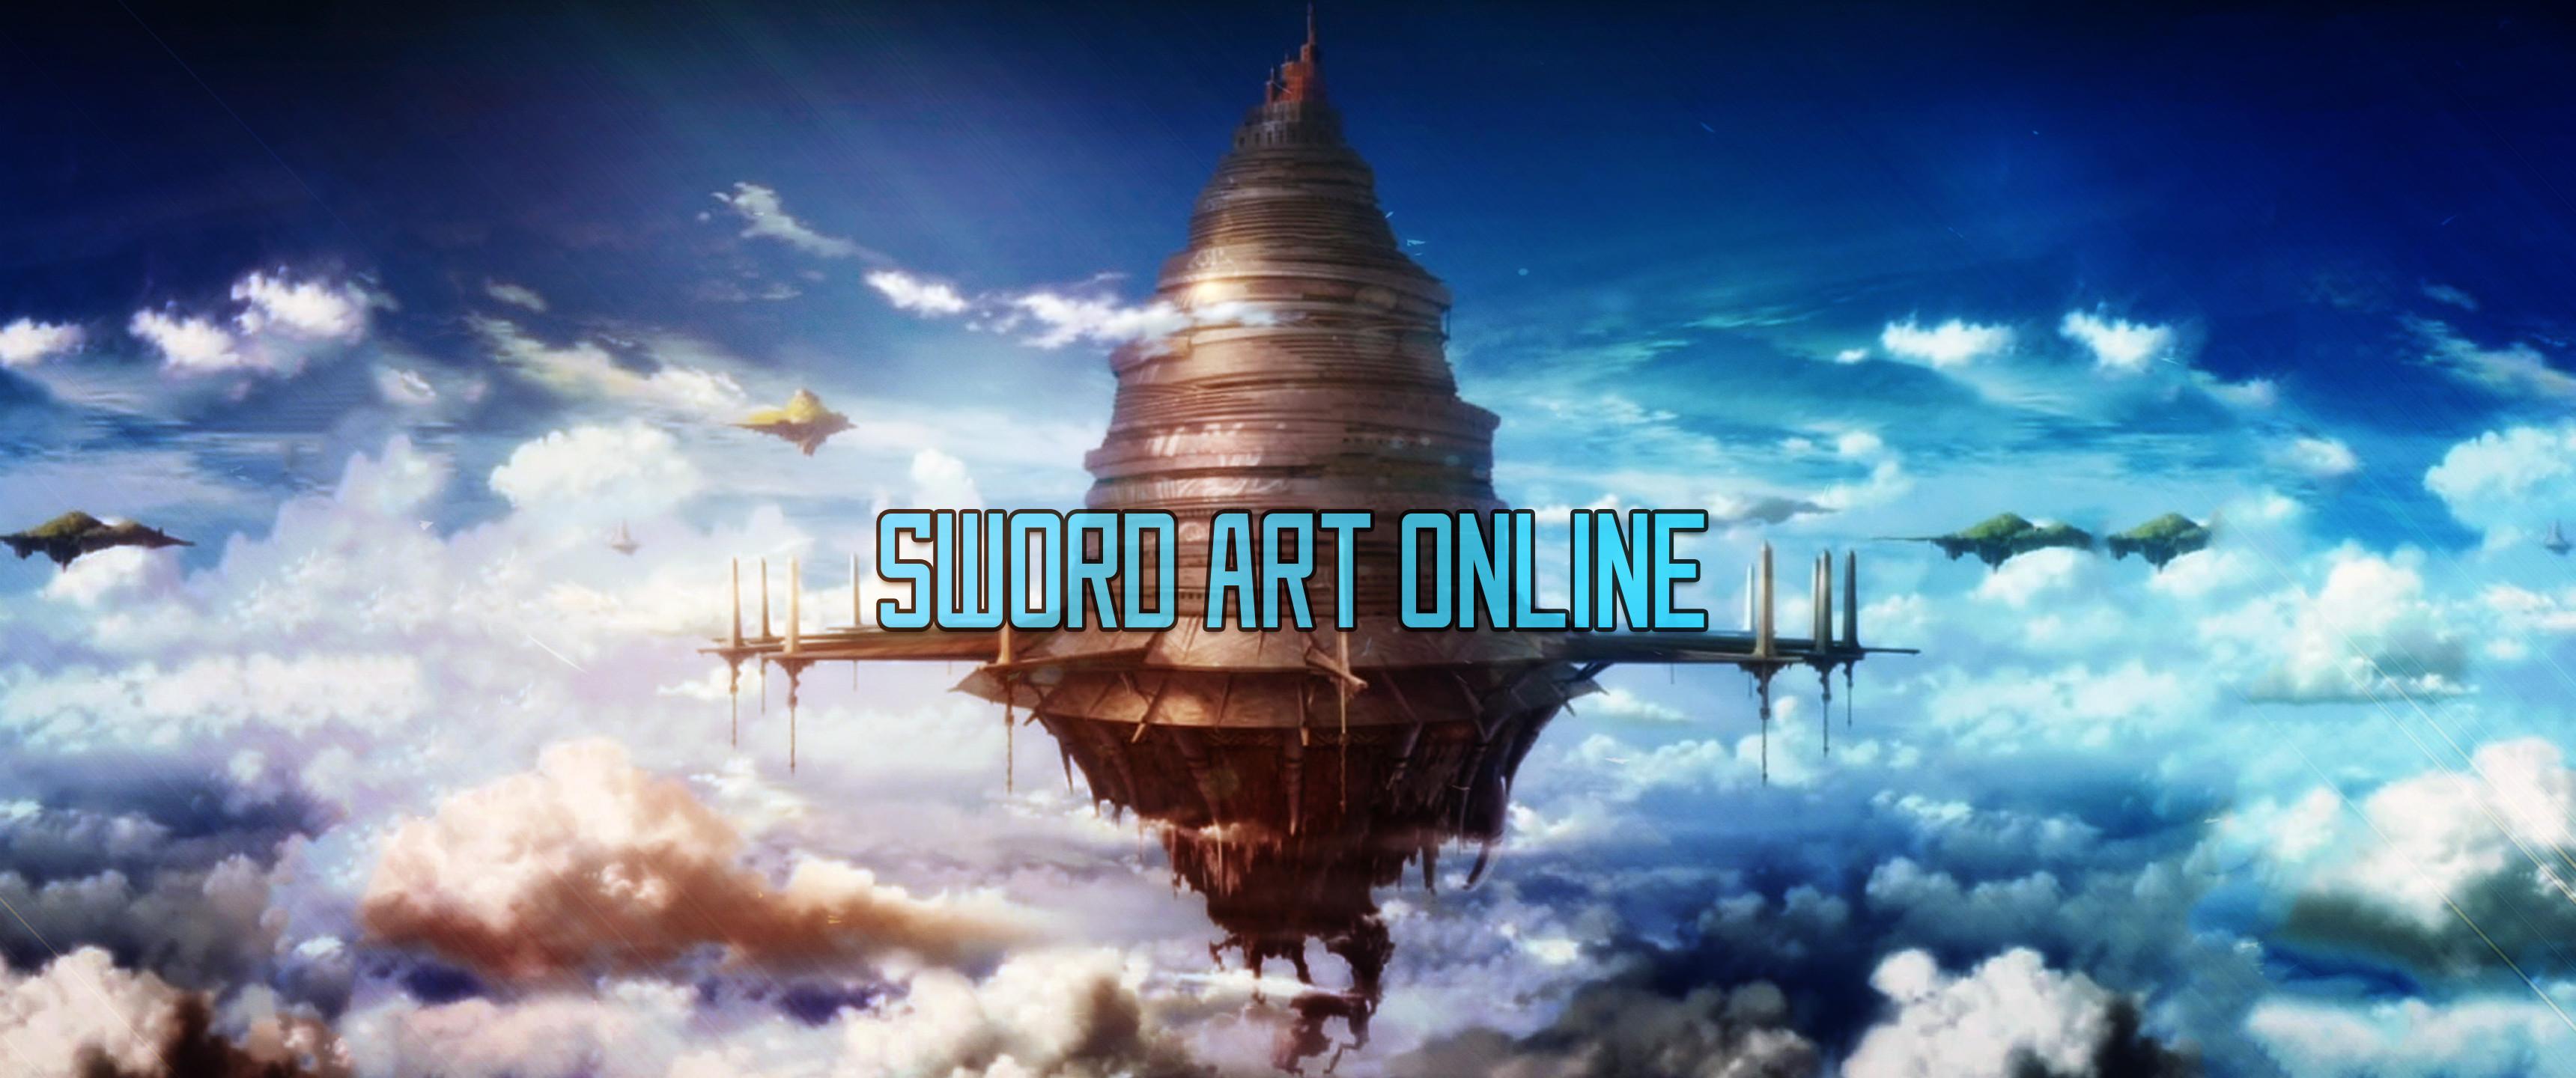 Aincrad Landscape Sword Art Online · HD Wallpaper   Background ID:672220